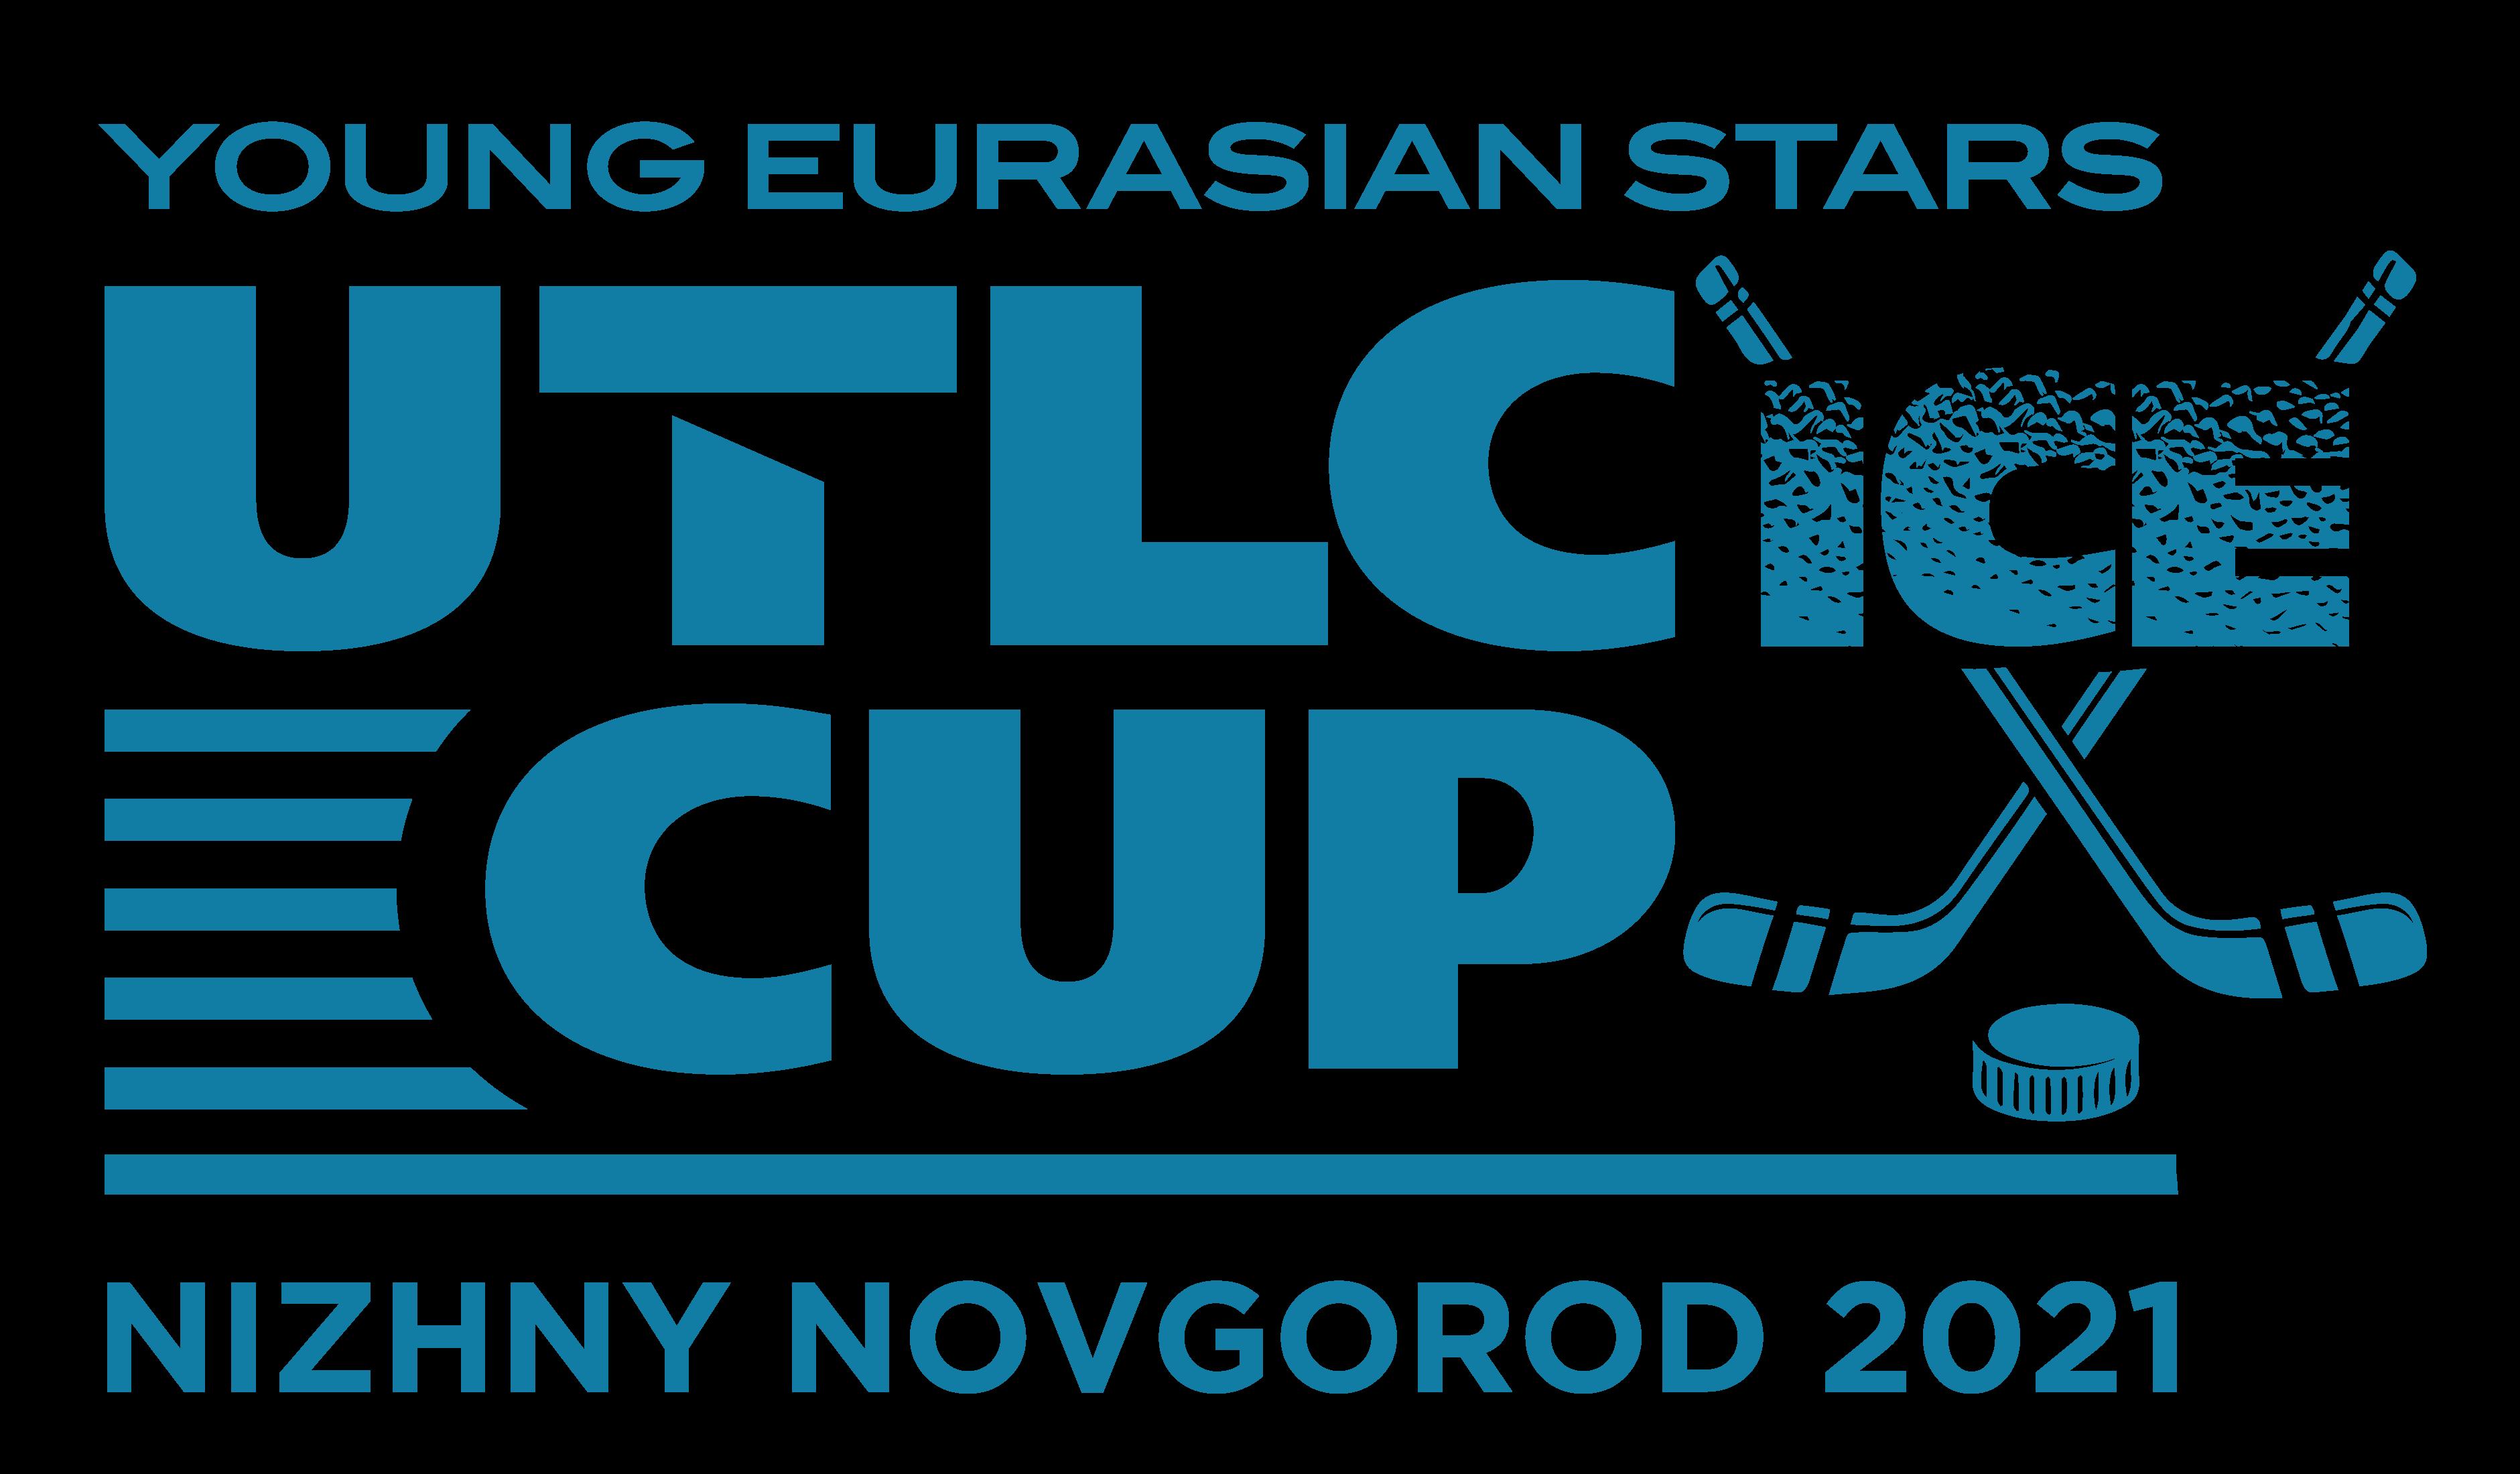 UTLC ICE Cup 2021